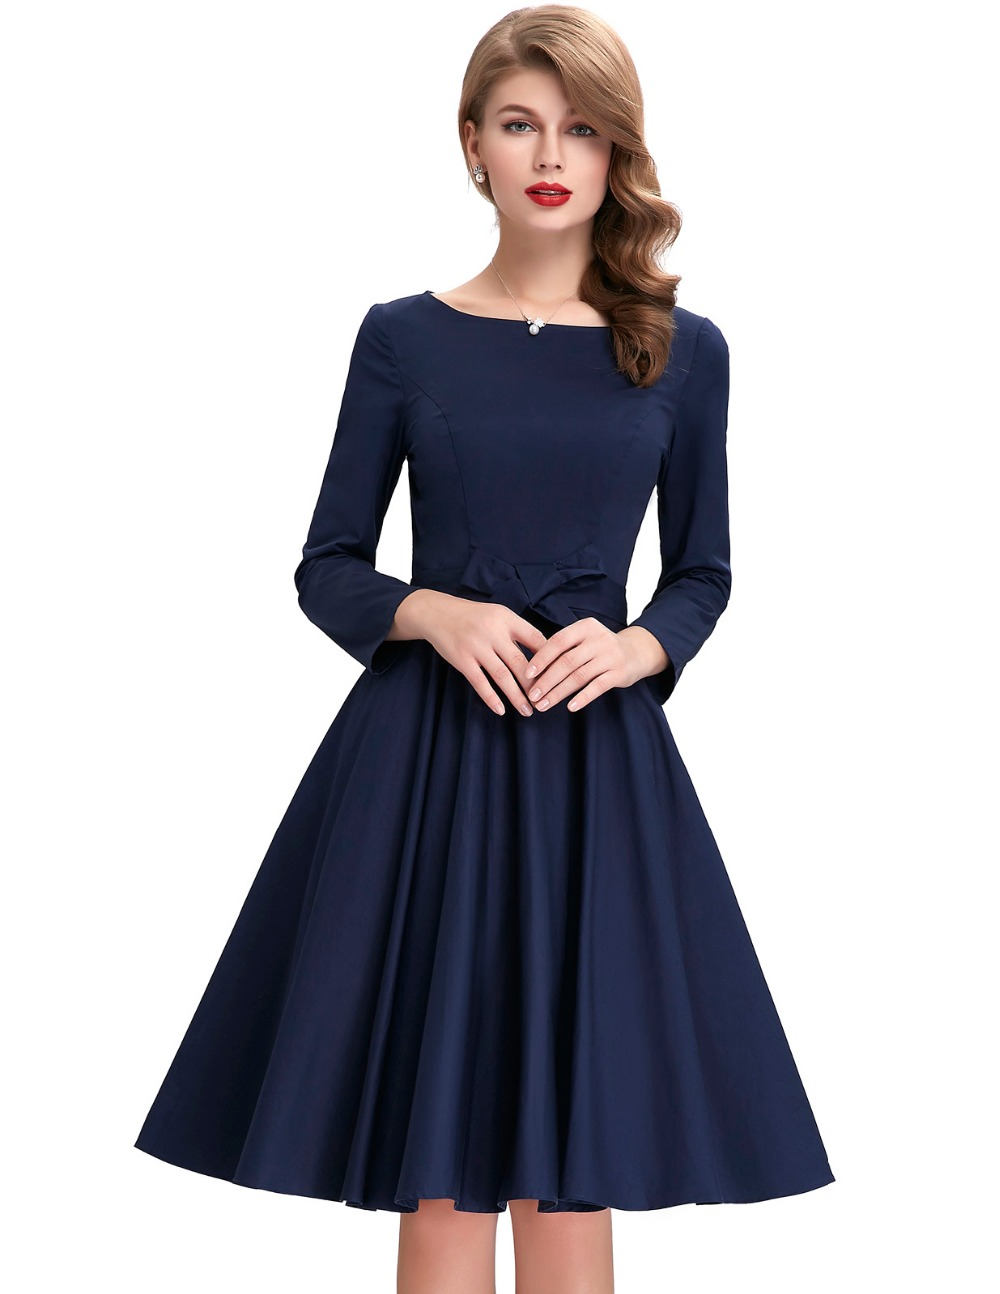 Online dress clothes